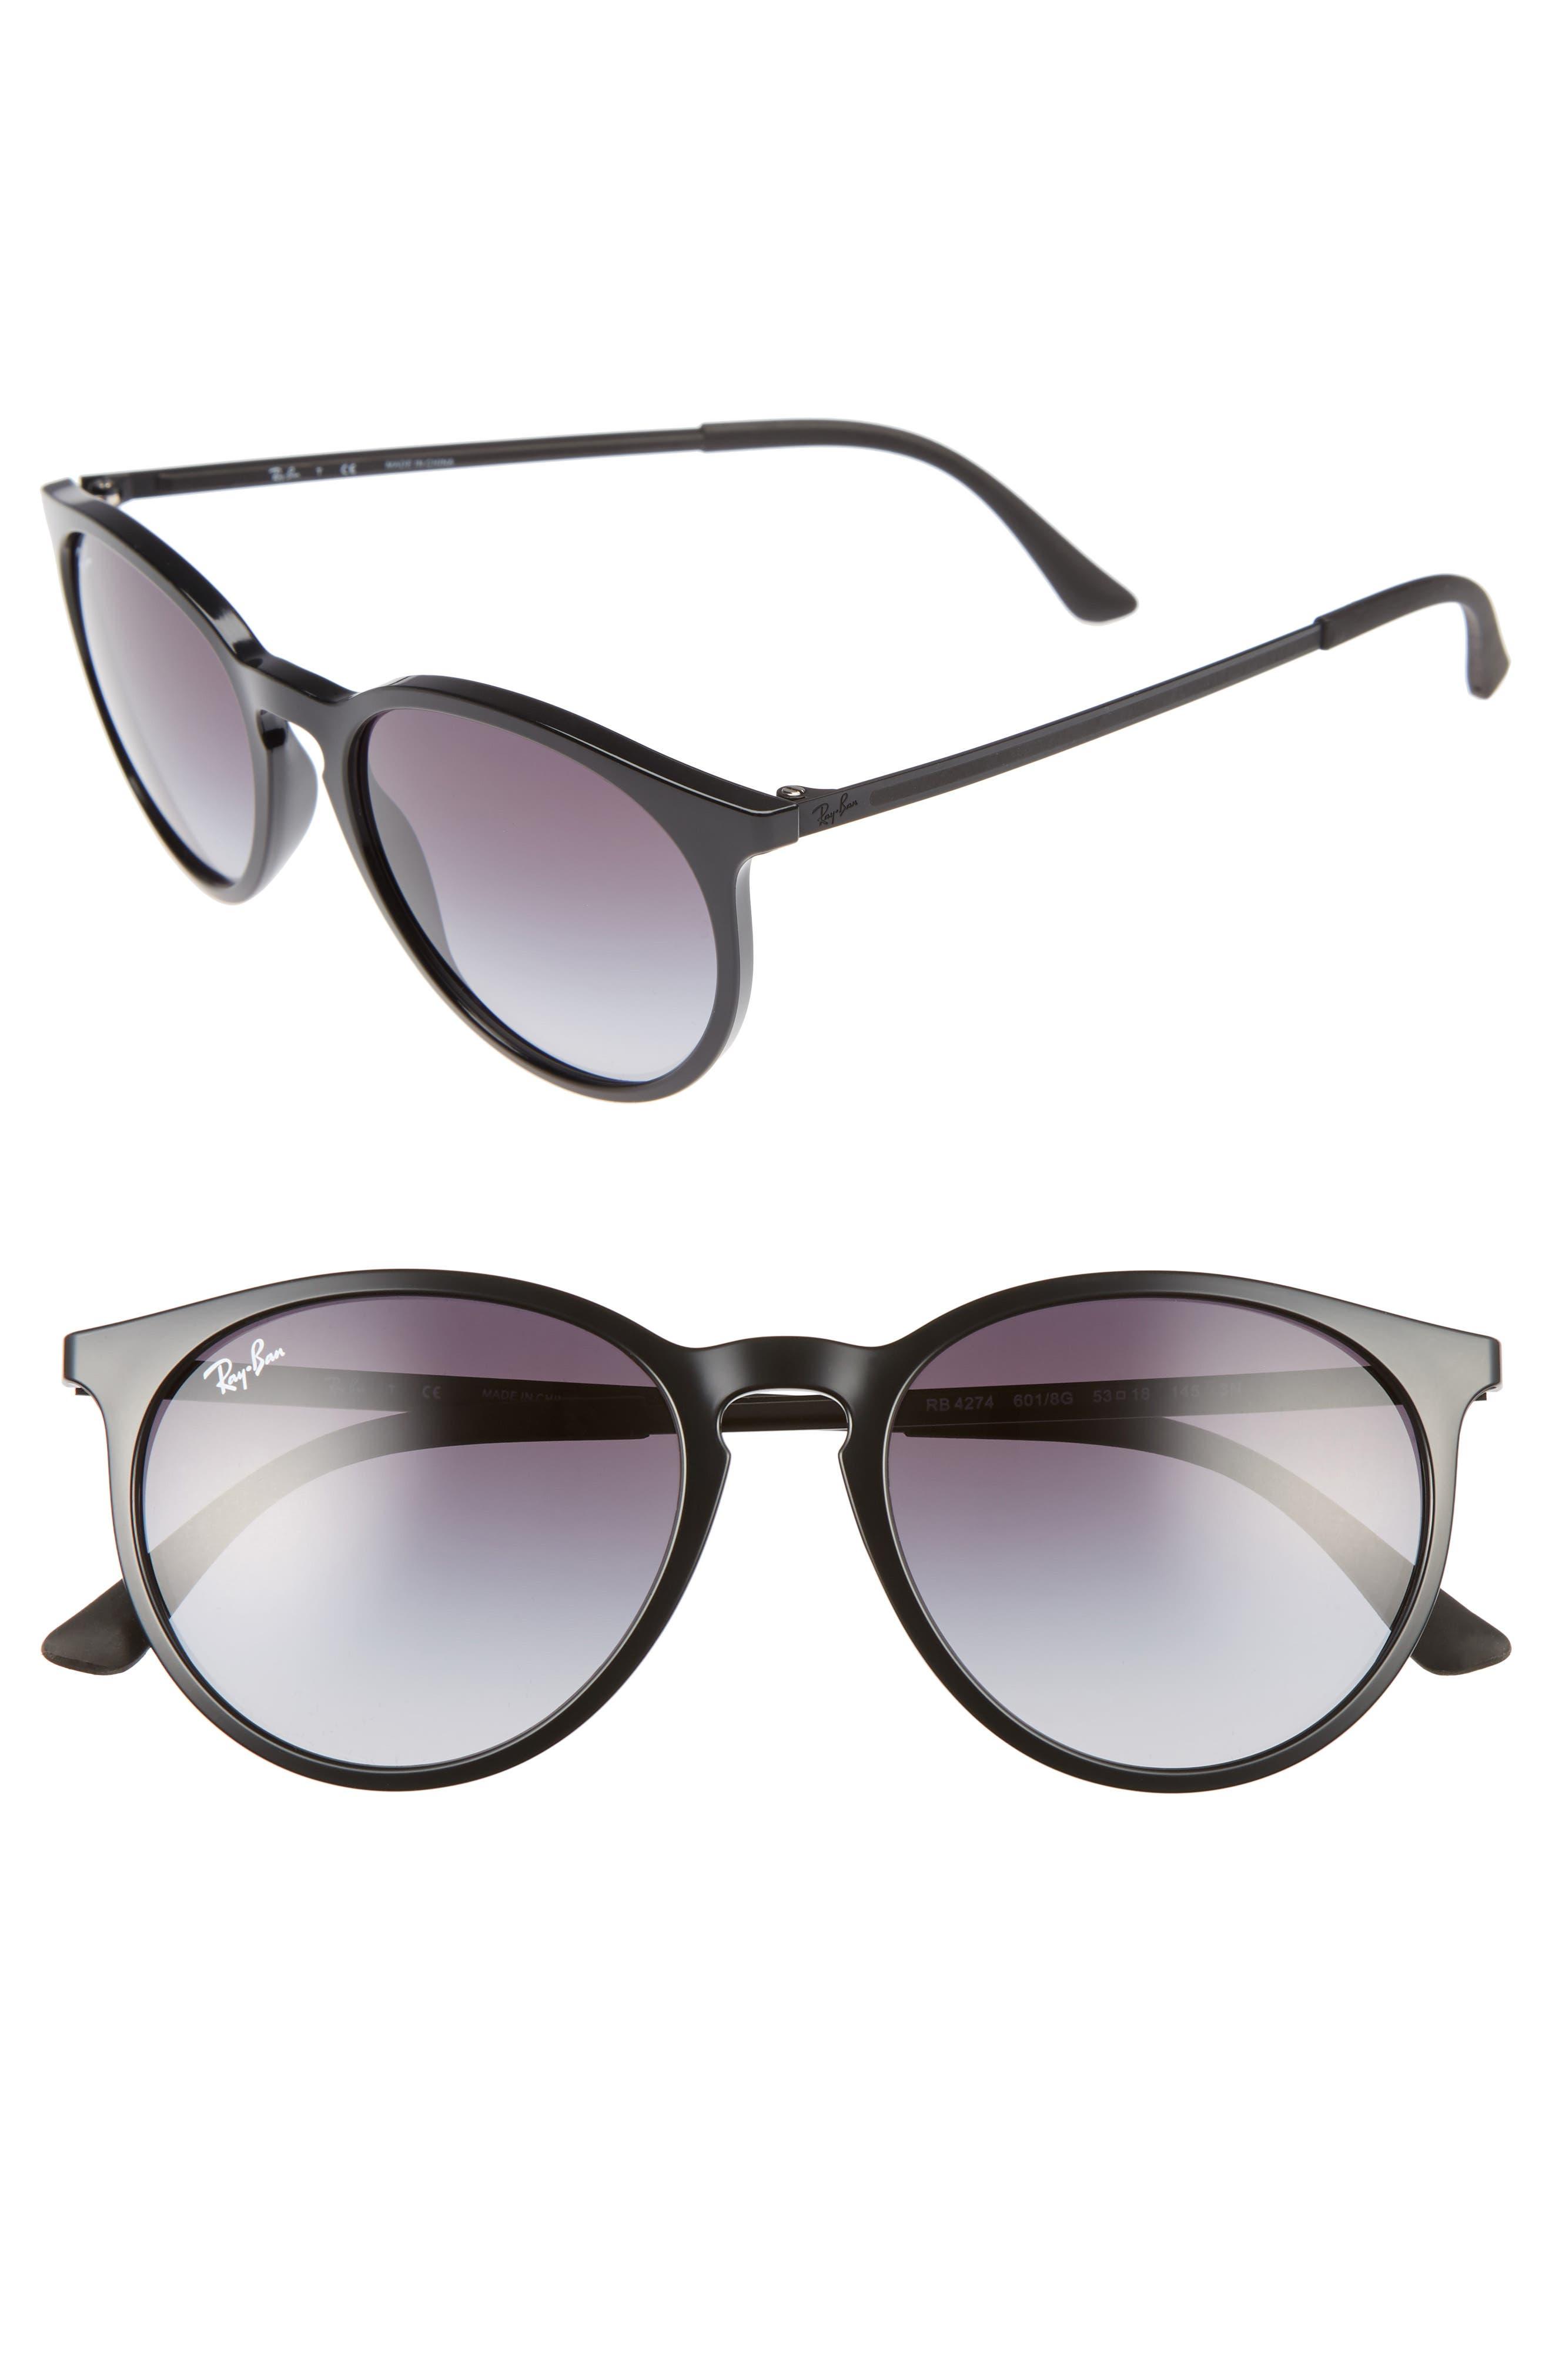 53mm Gradient Lens Retro Sunglasses,                         Main,                         color, Black